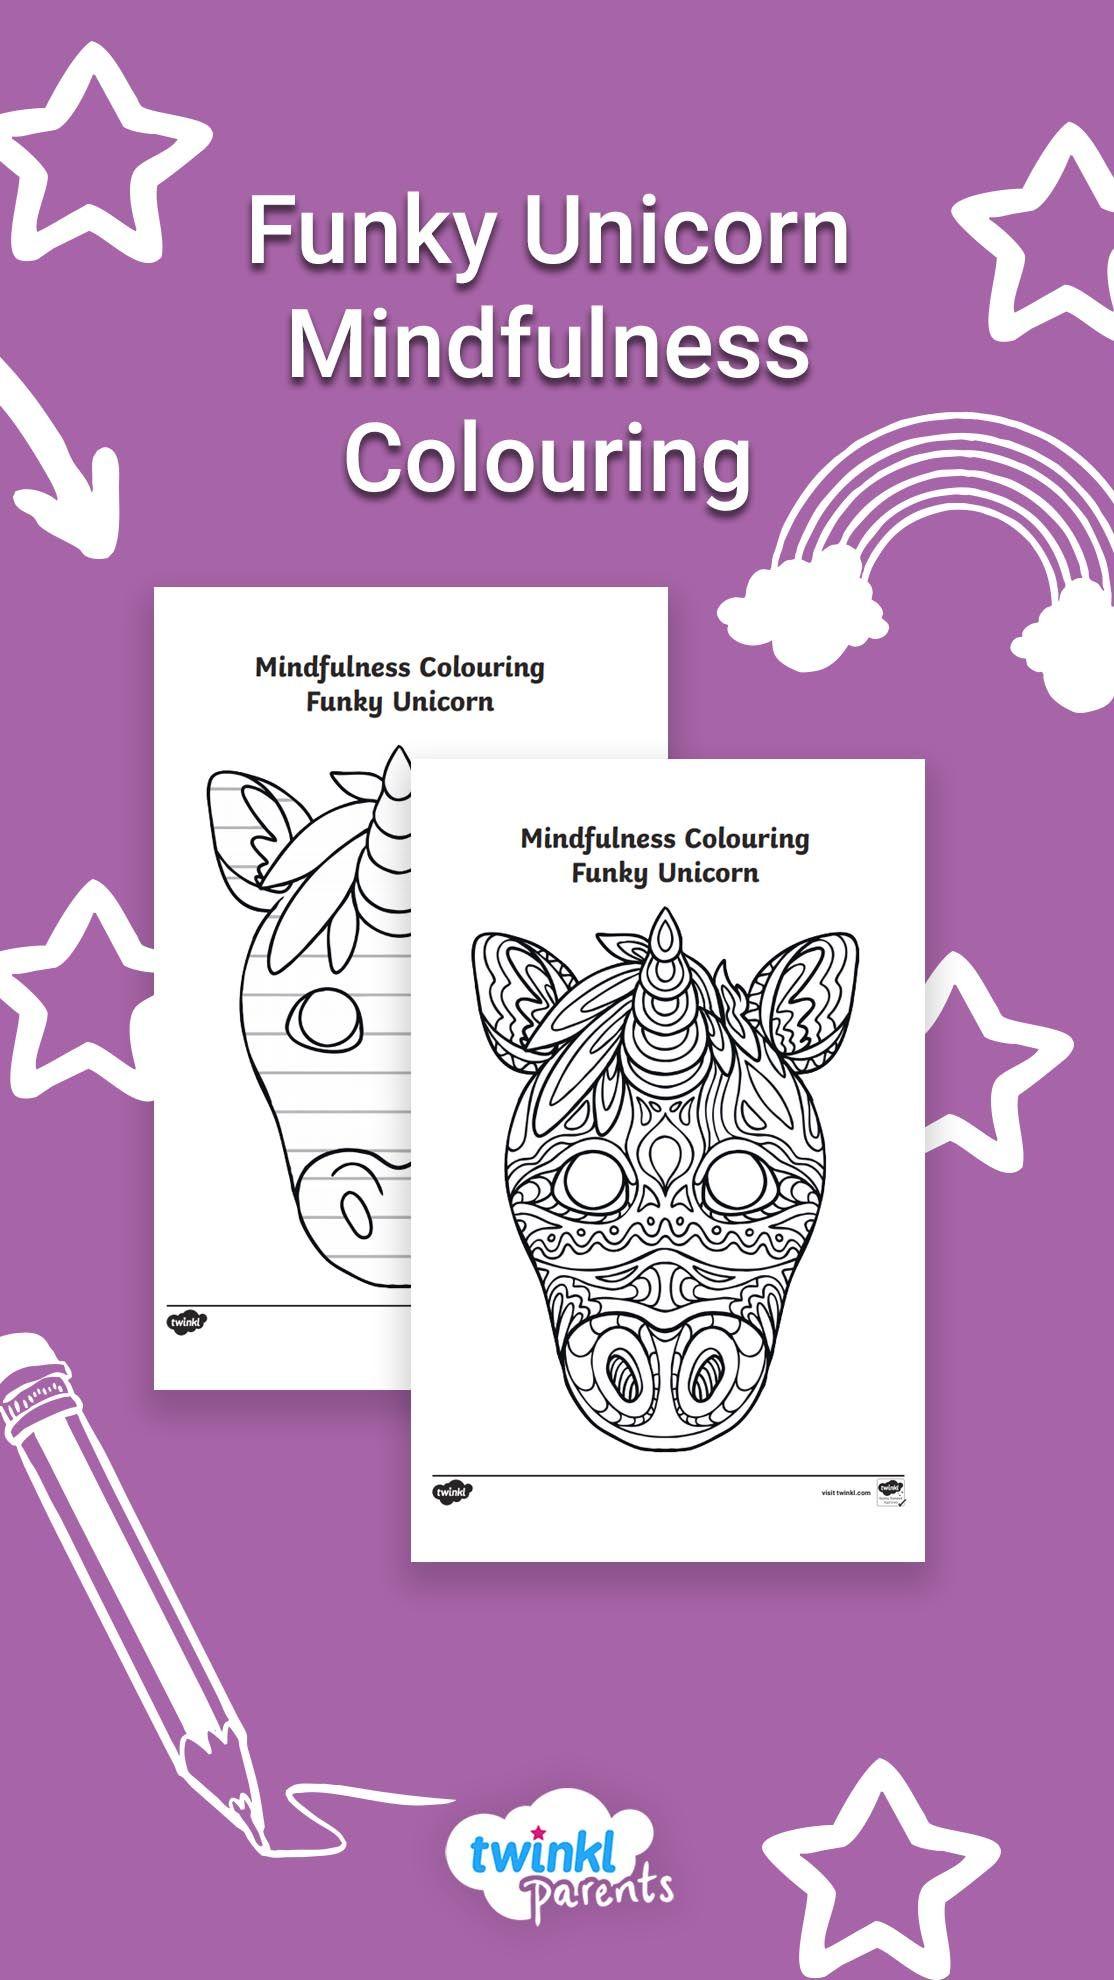 Funky Unicorn Mindfulness Colouring Mindfulness Colouring Mindfulness For Kids Learning Colors